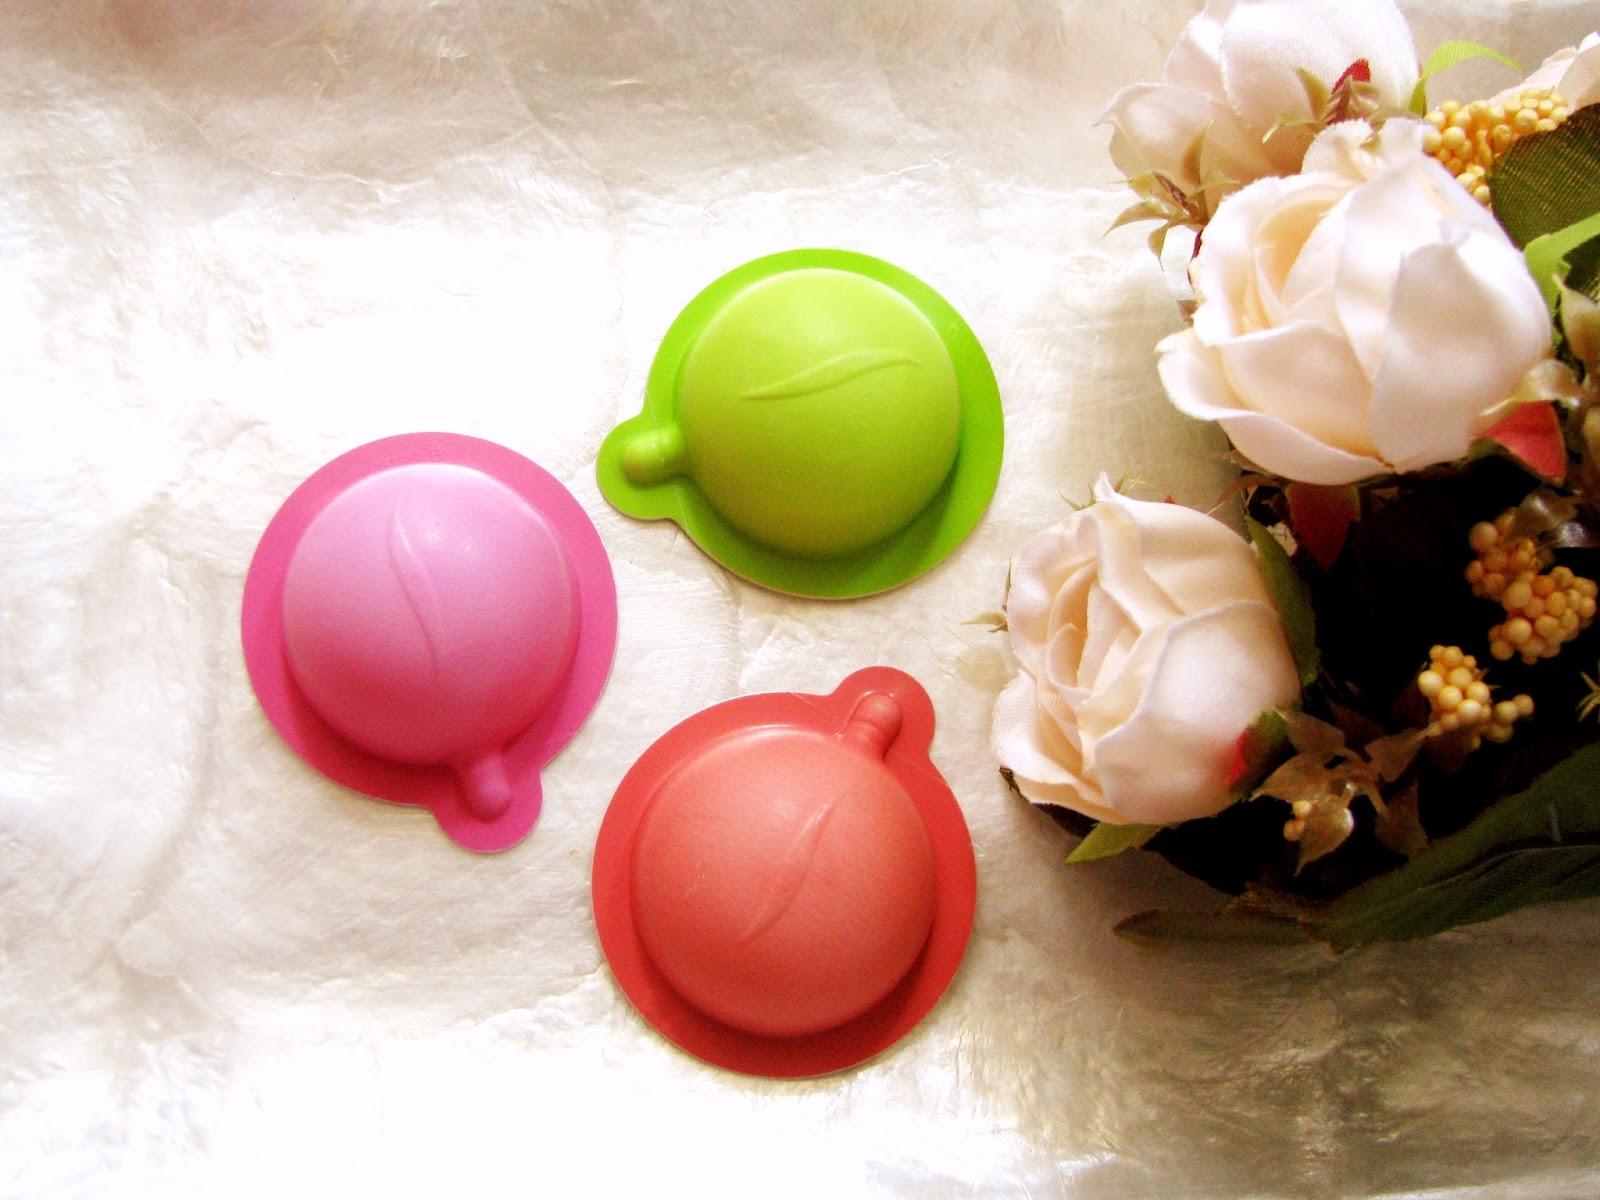 http://www.lightsandlatte.com/2016/03/travel-beauty-buddies-sephora-creamy.html